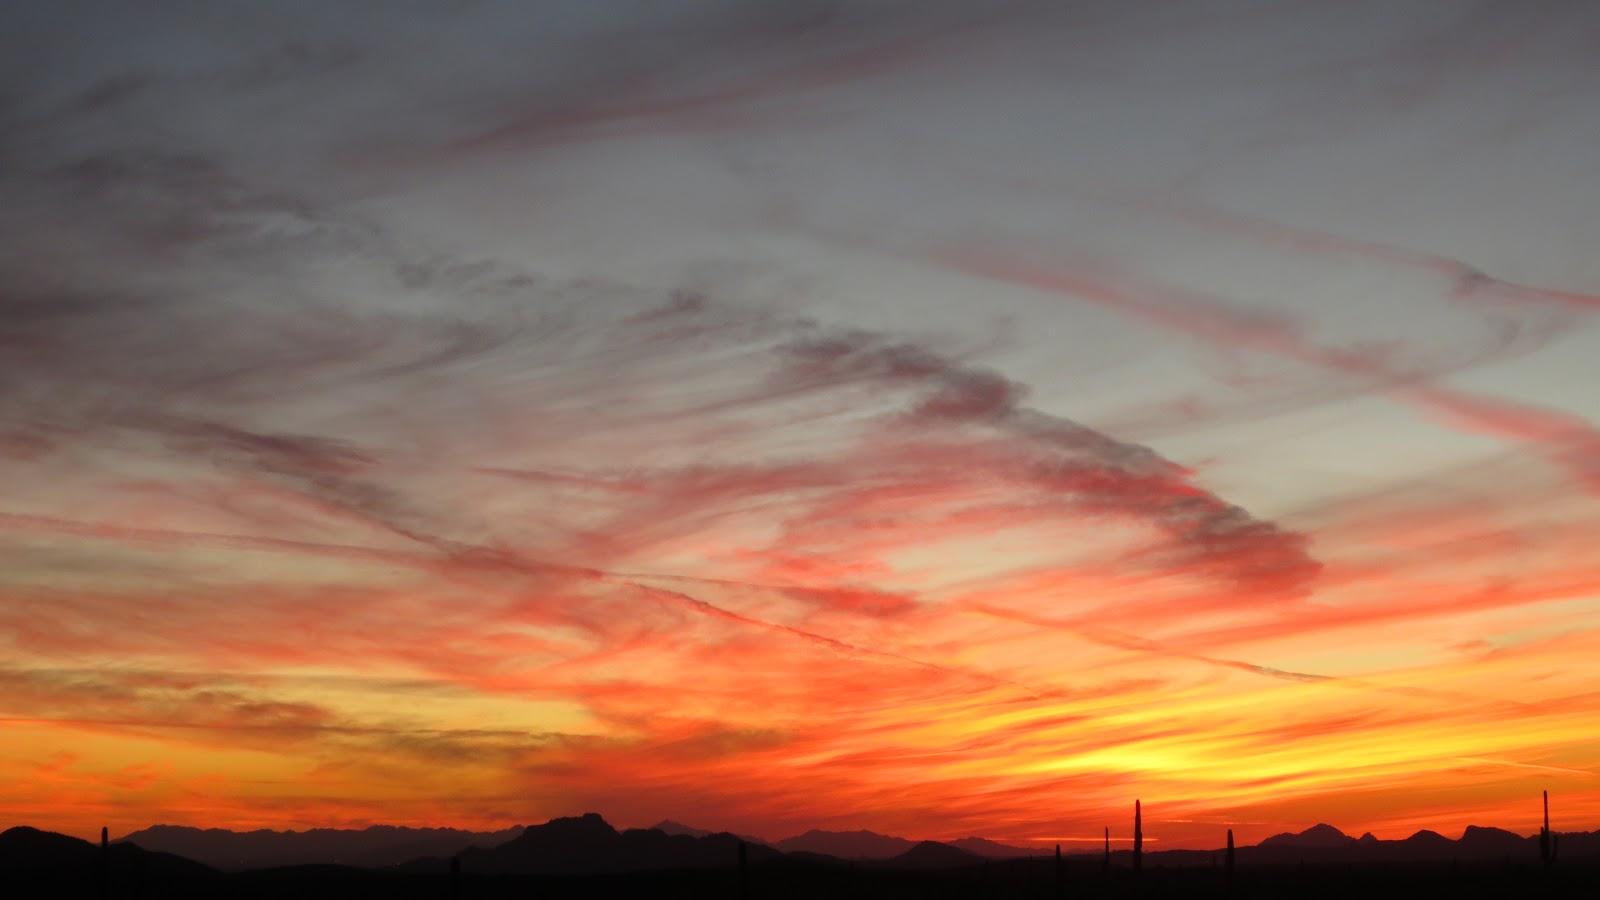 arizona sunset pictures 30129